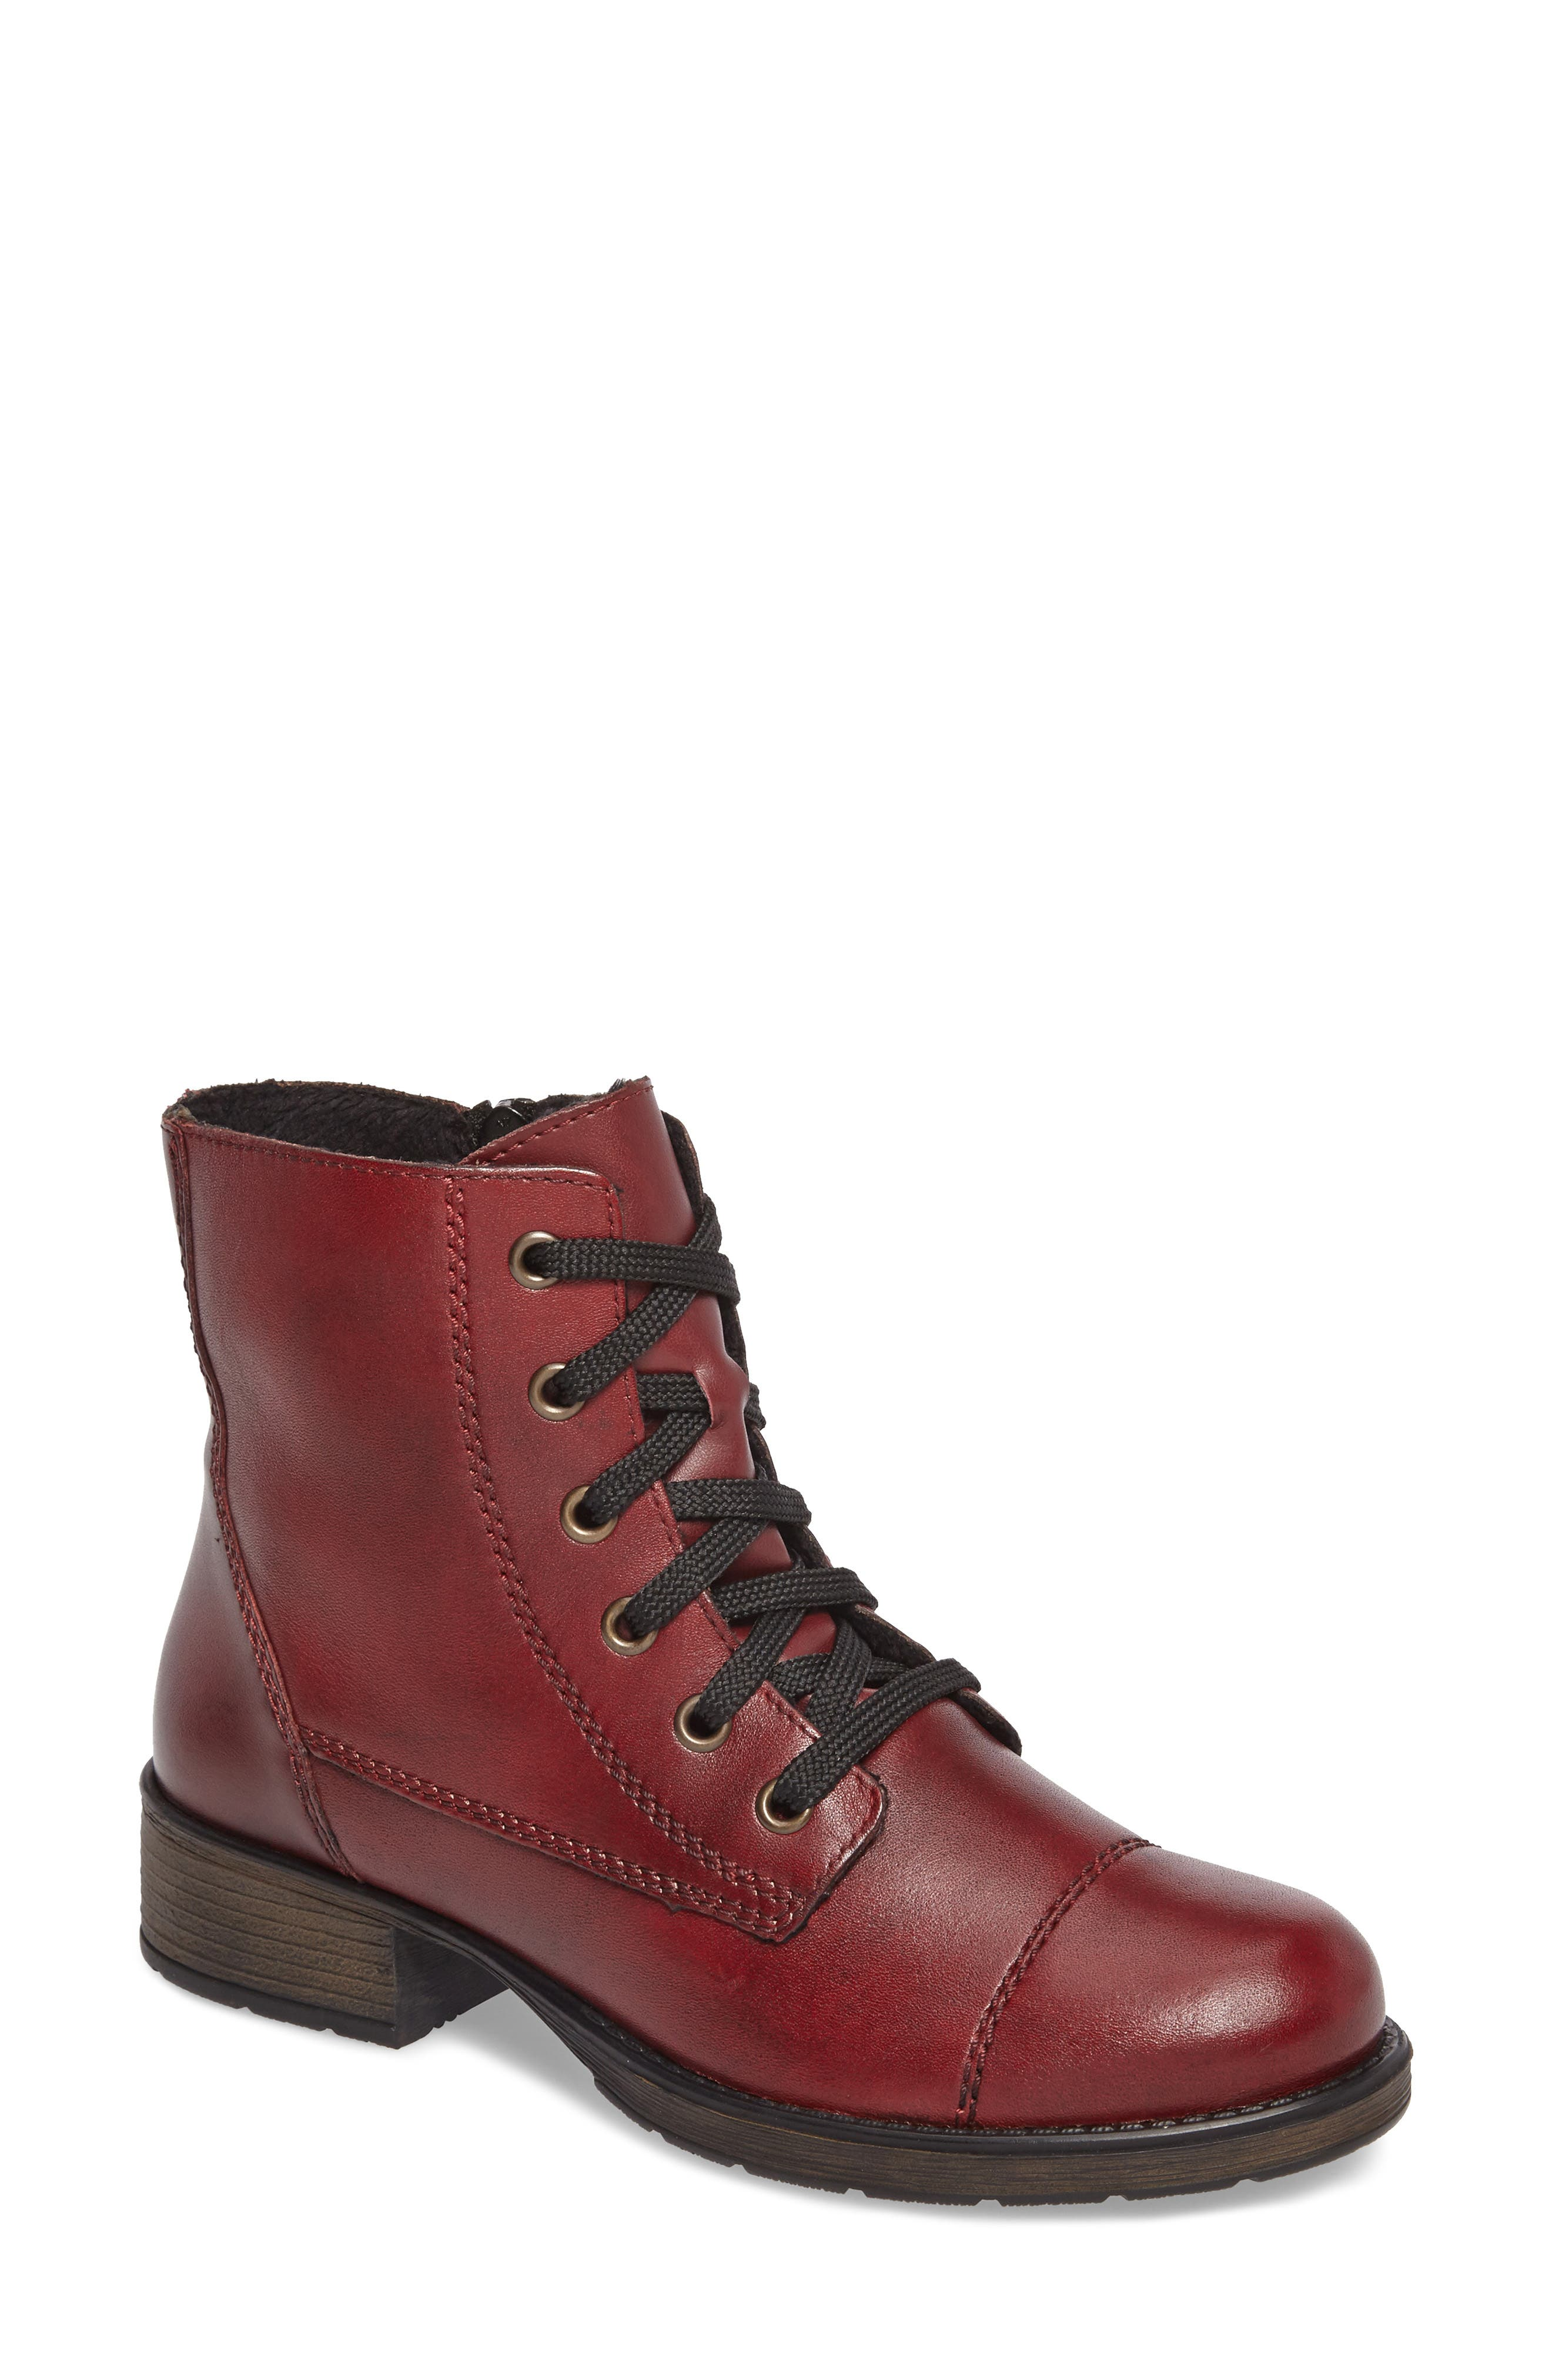 Main Image - Rieker Antistress Faith 10 Lace-Up Boot (Women)